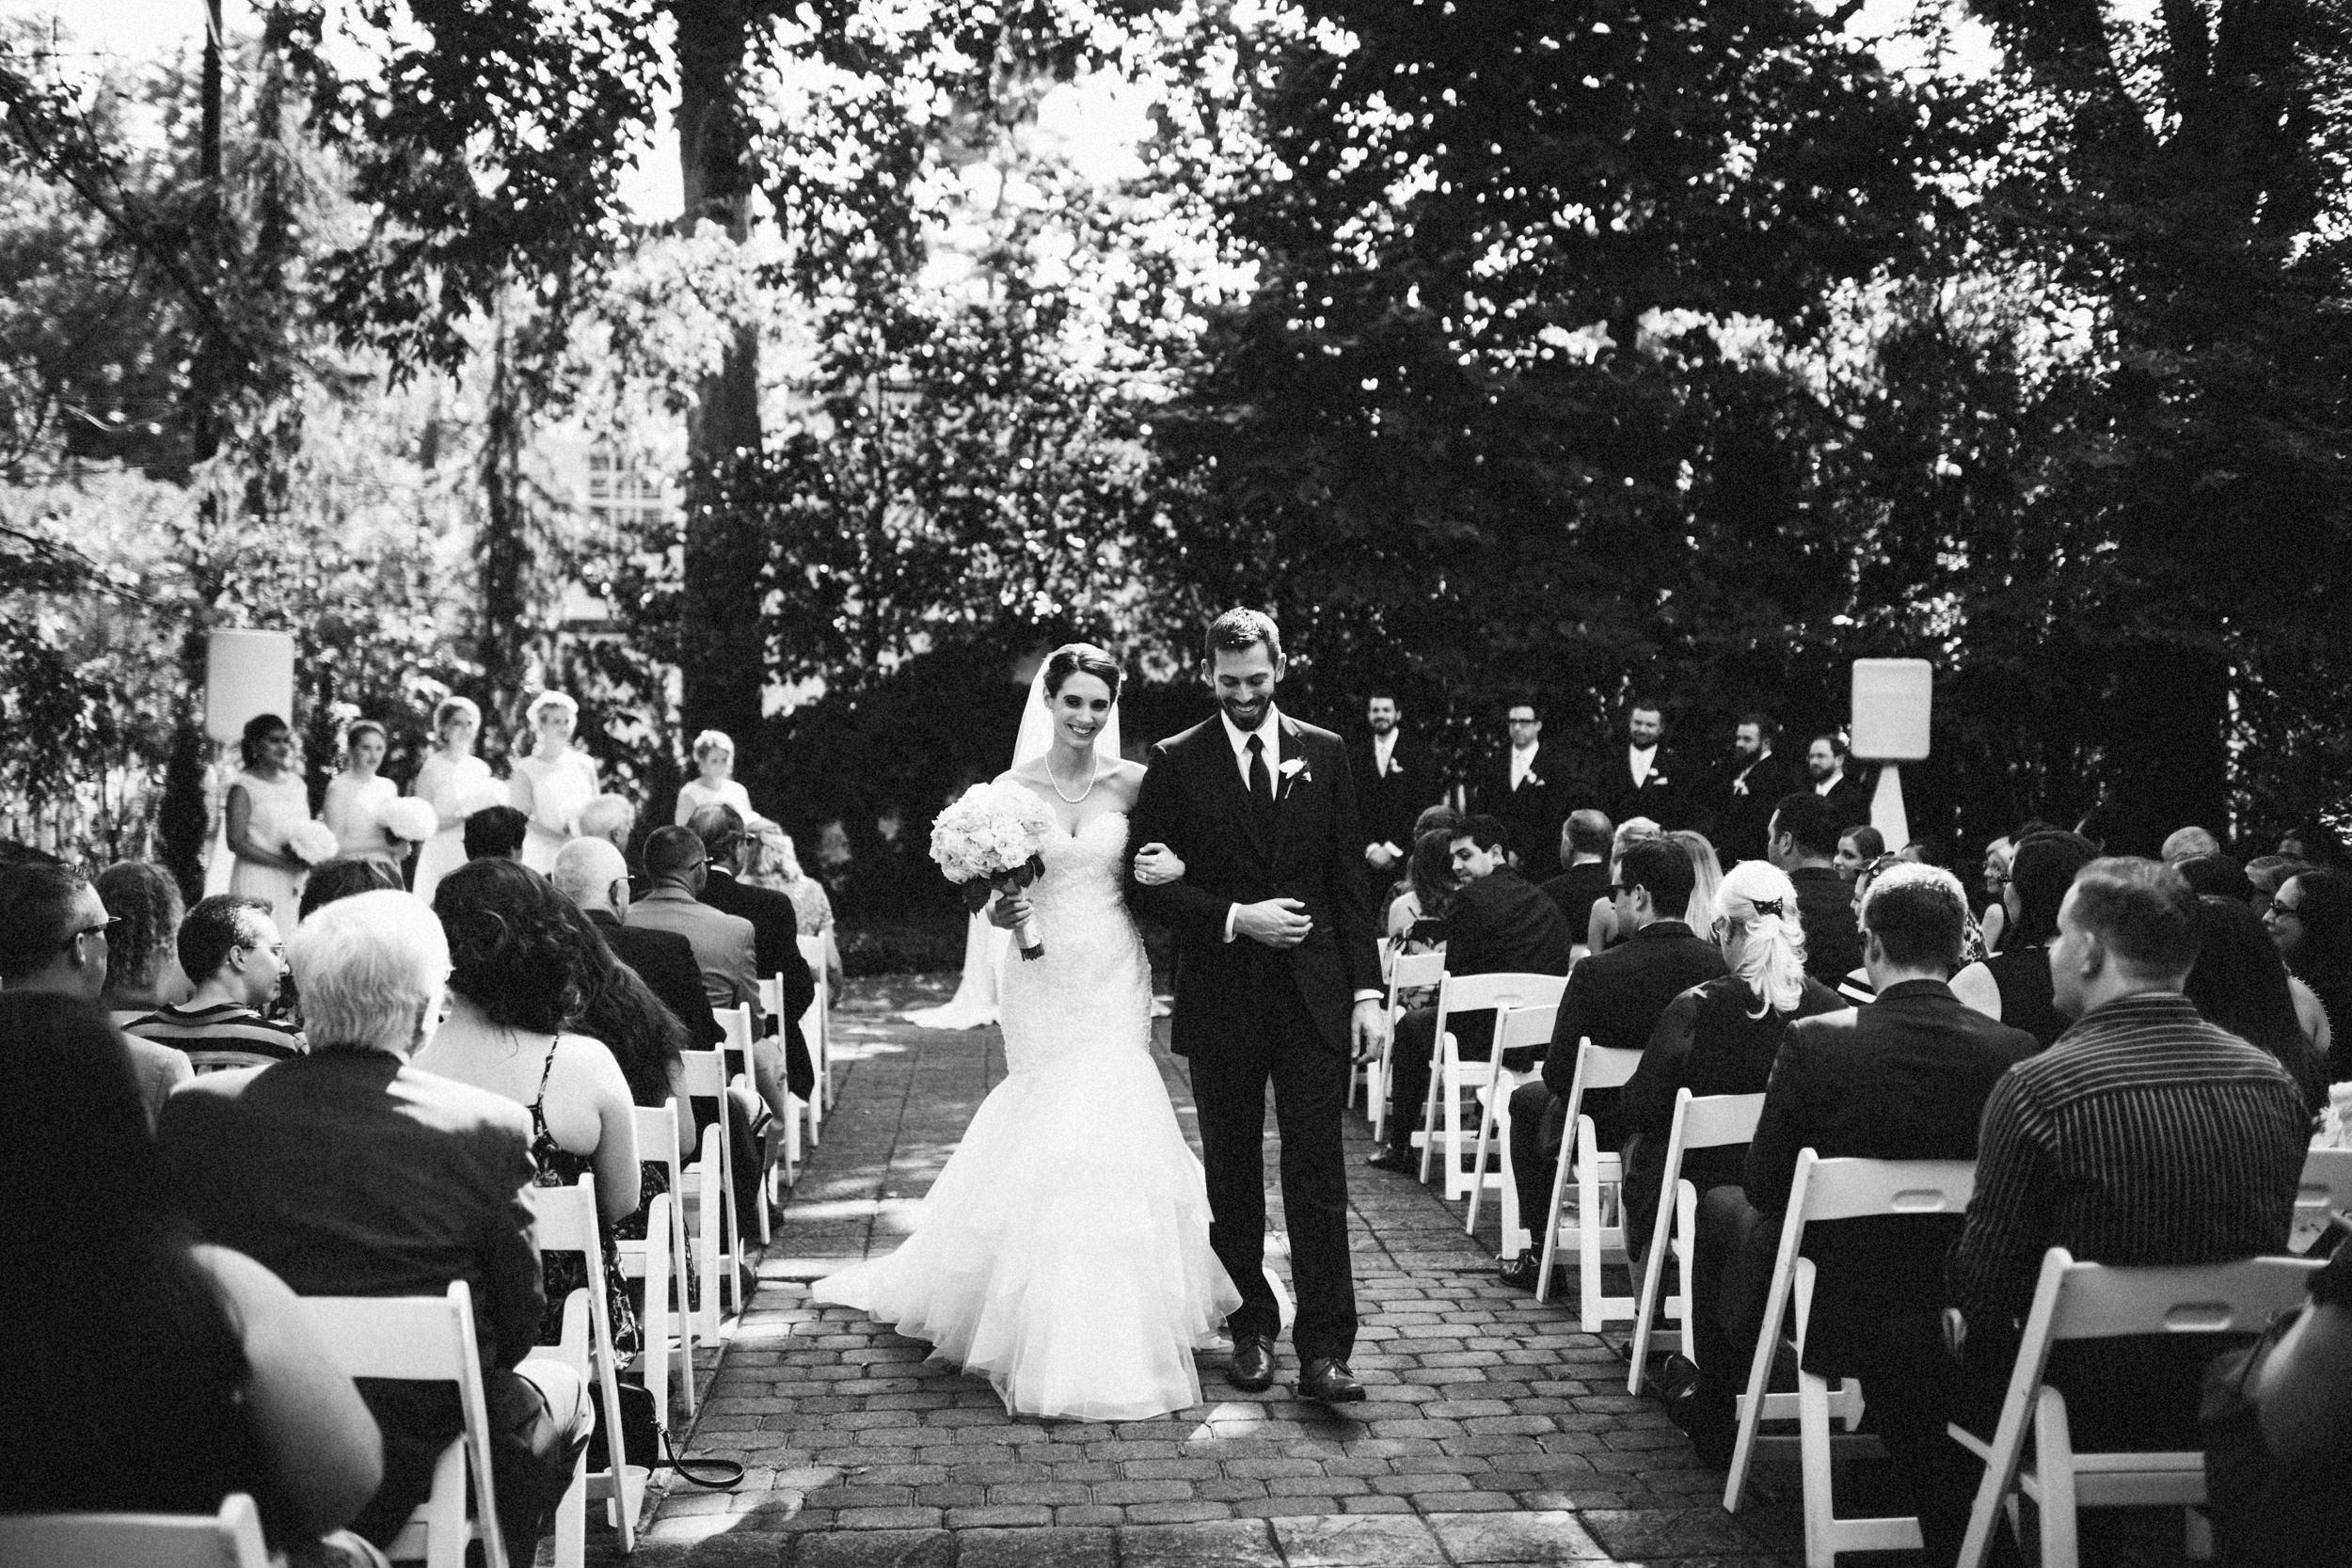 Louisville-Kentucky-Wedding-Elopement-Photographer-Sarah-Katherine-Davis-Photography-Whitehall-Classic-Timeless-Garden-Wedding-430.jpg